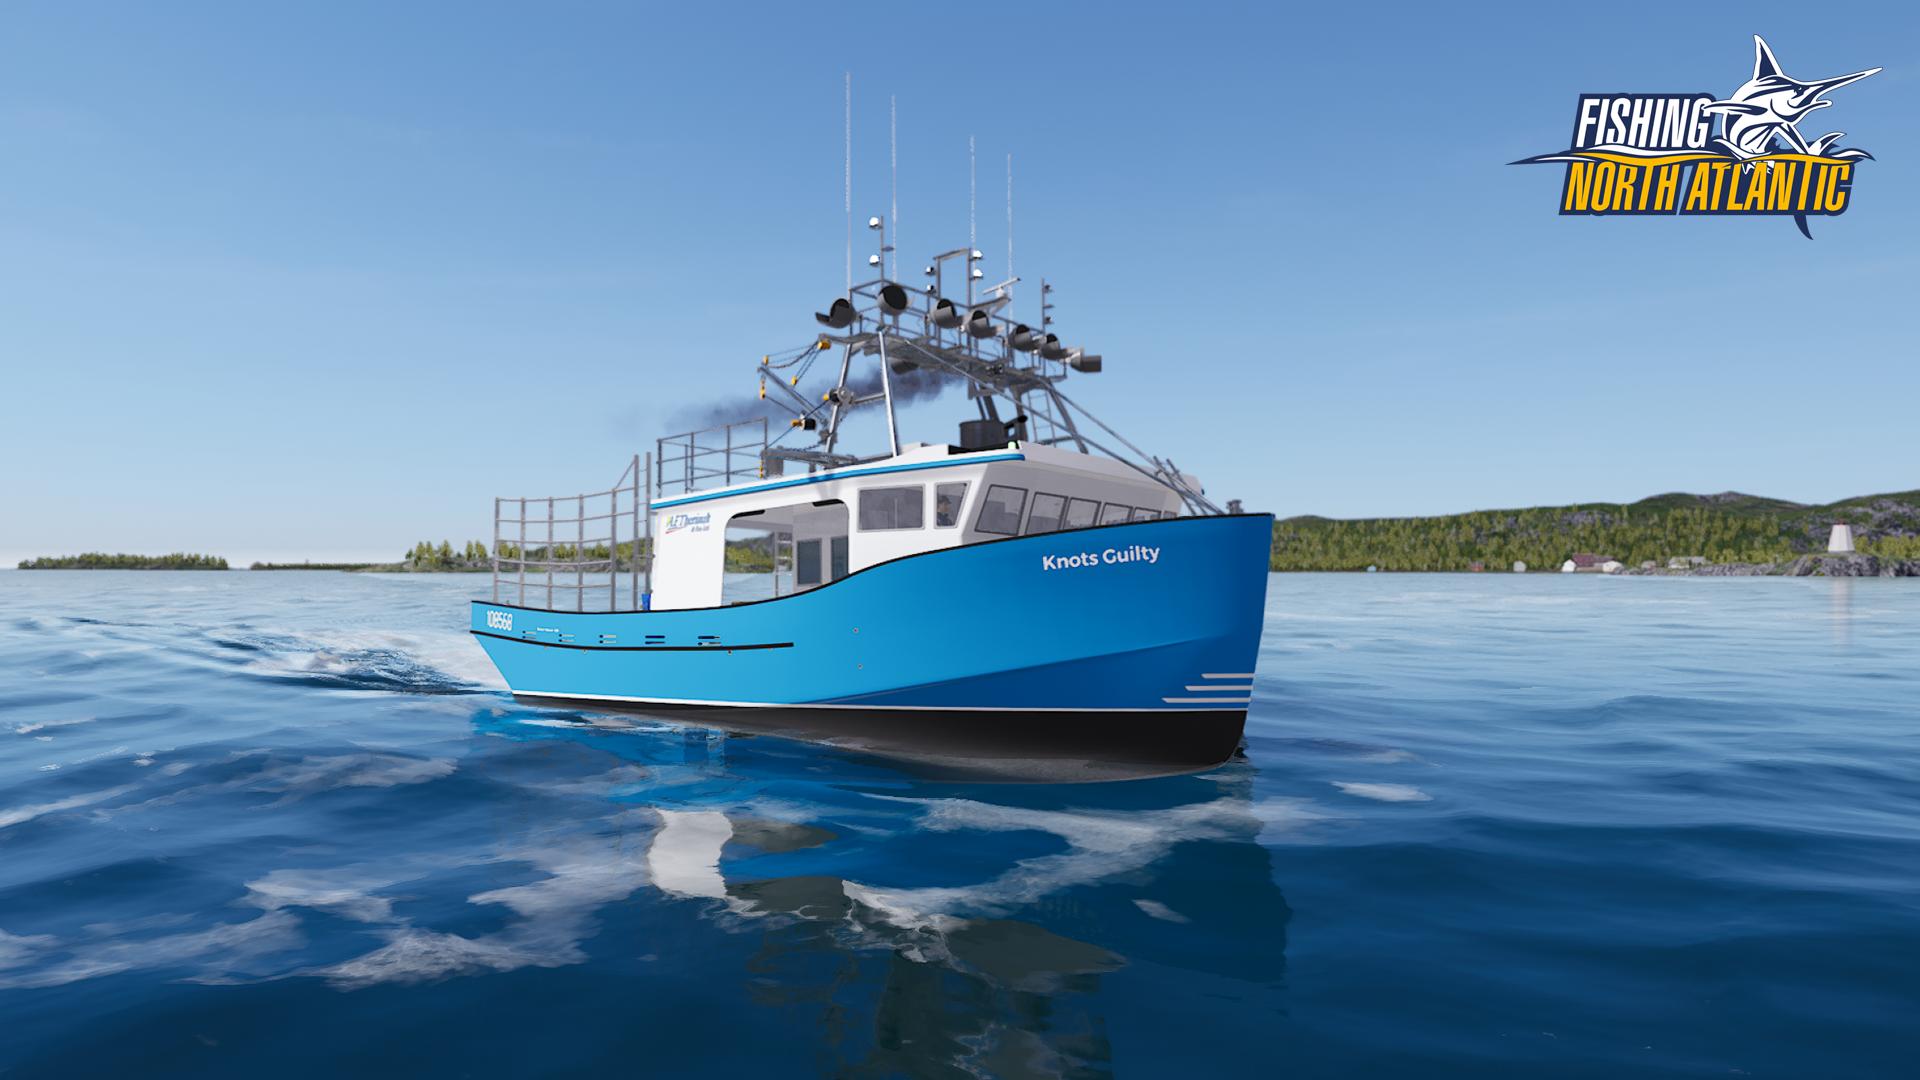 Screenshot of Fishing: North Atlantic